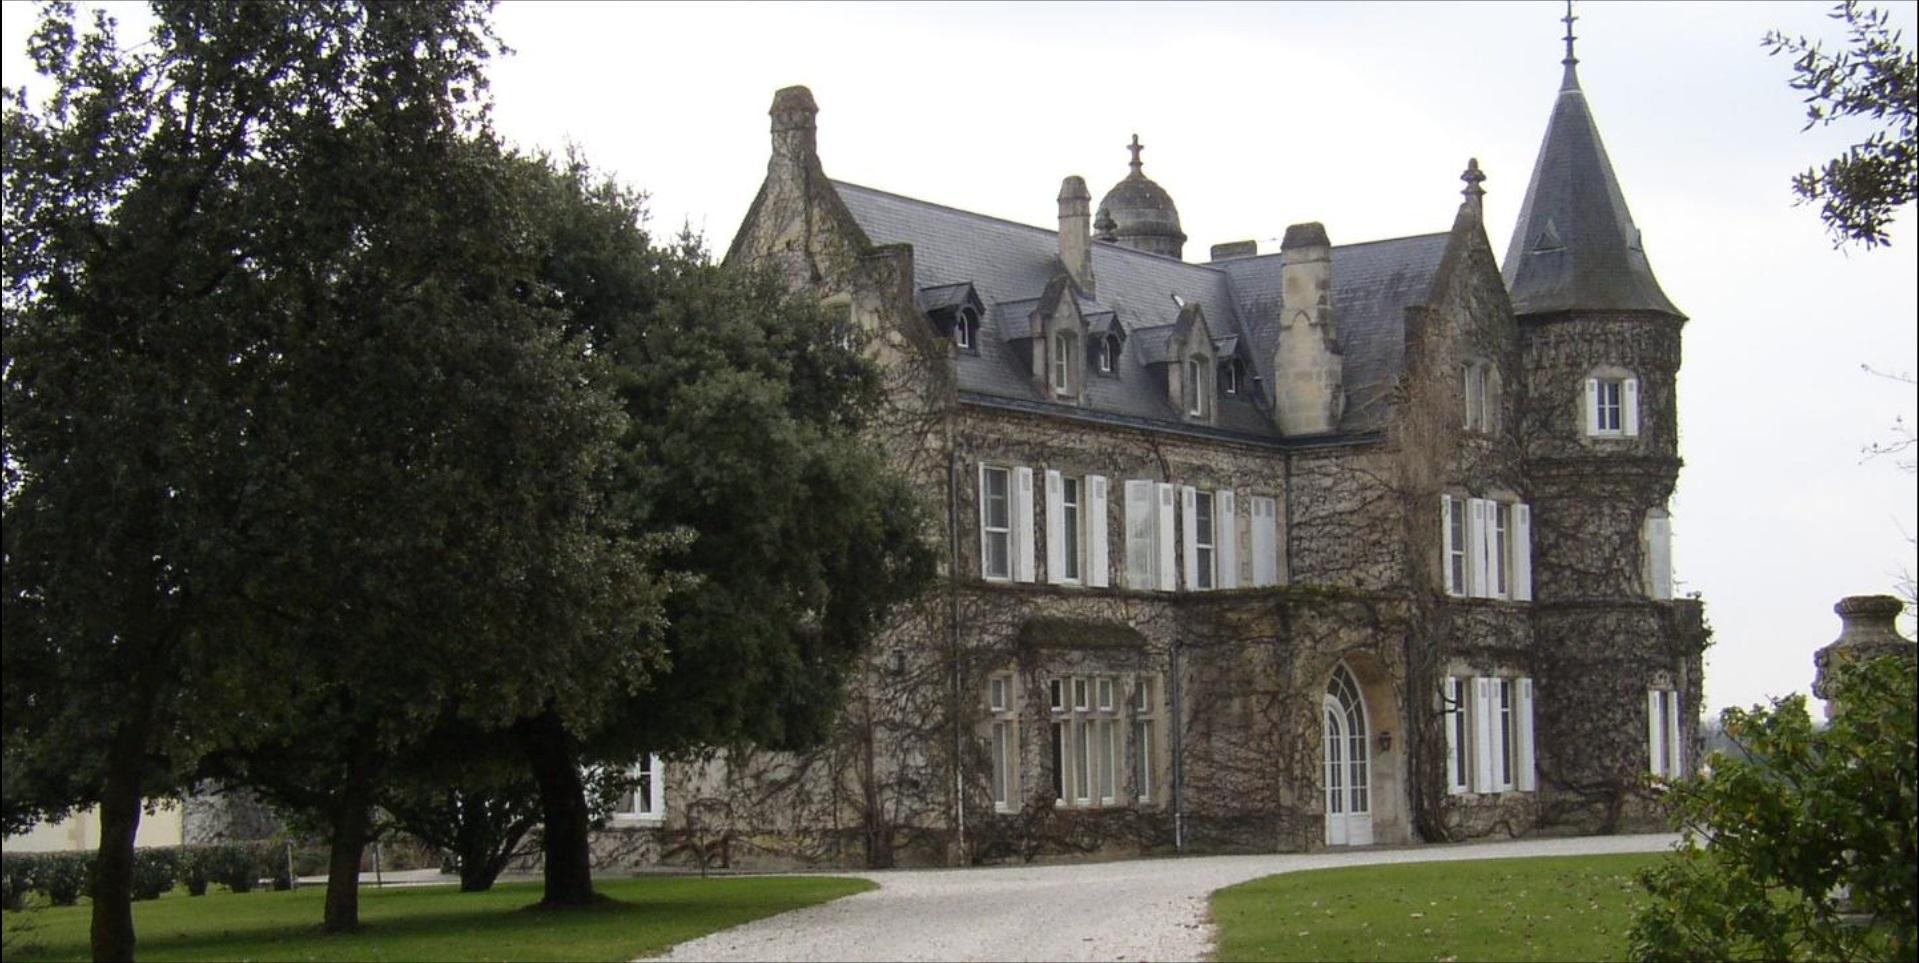 Lascombes château